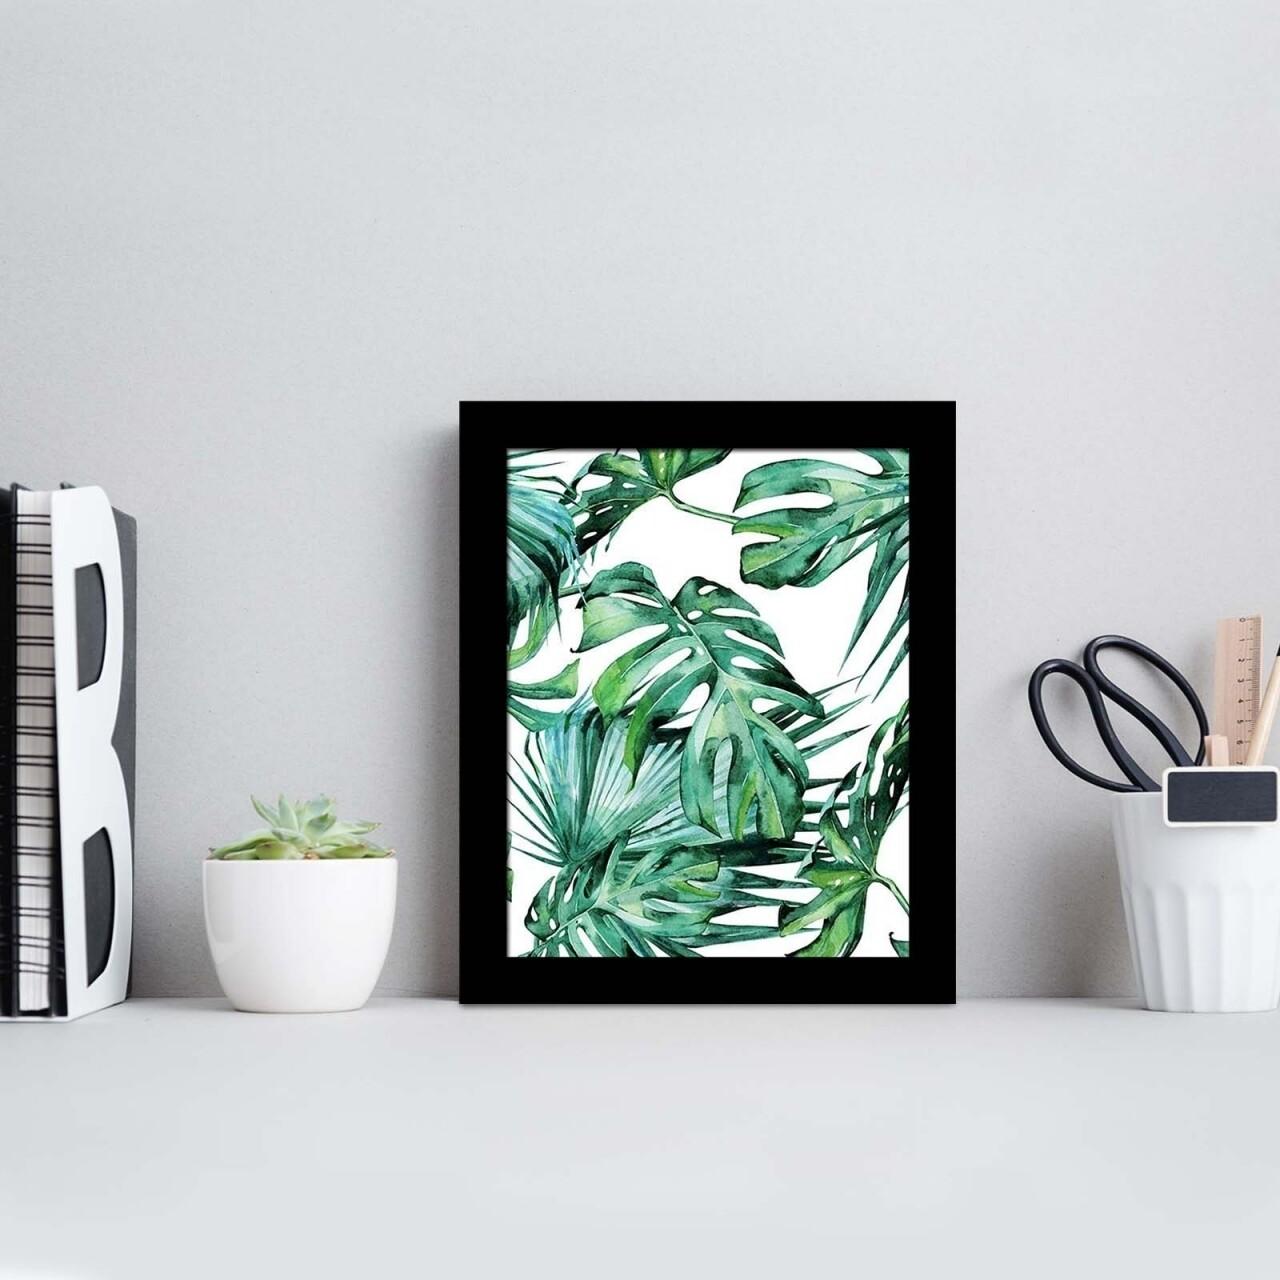 Tablou decorativ, Alpha Wall, Green Leaves, 23x28 cm